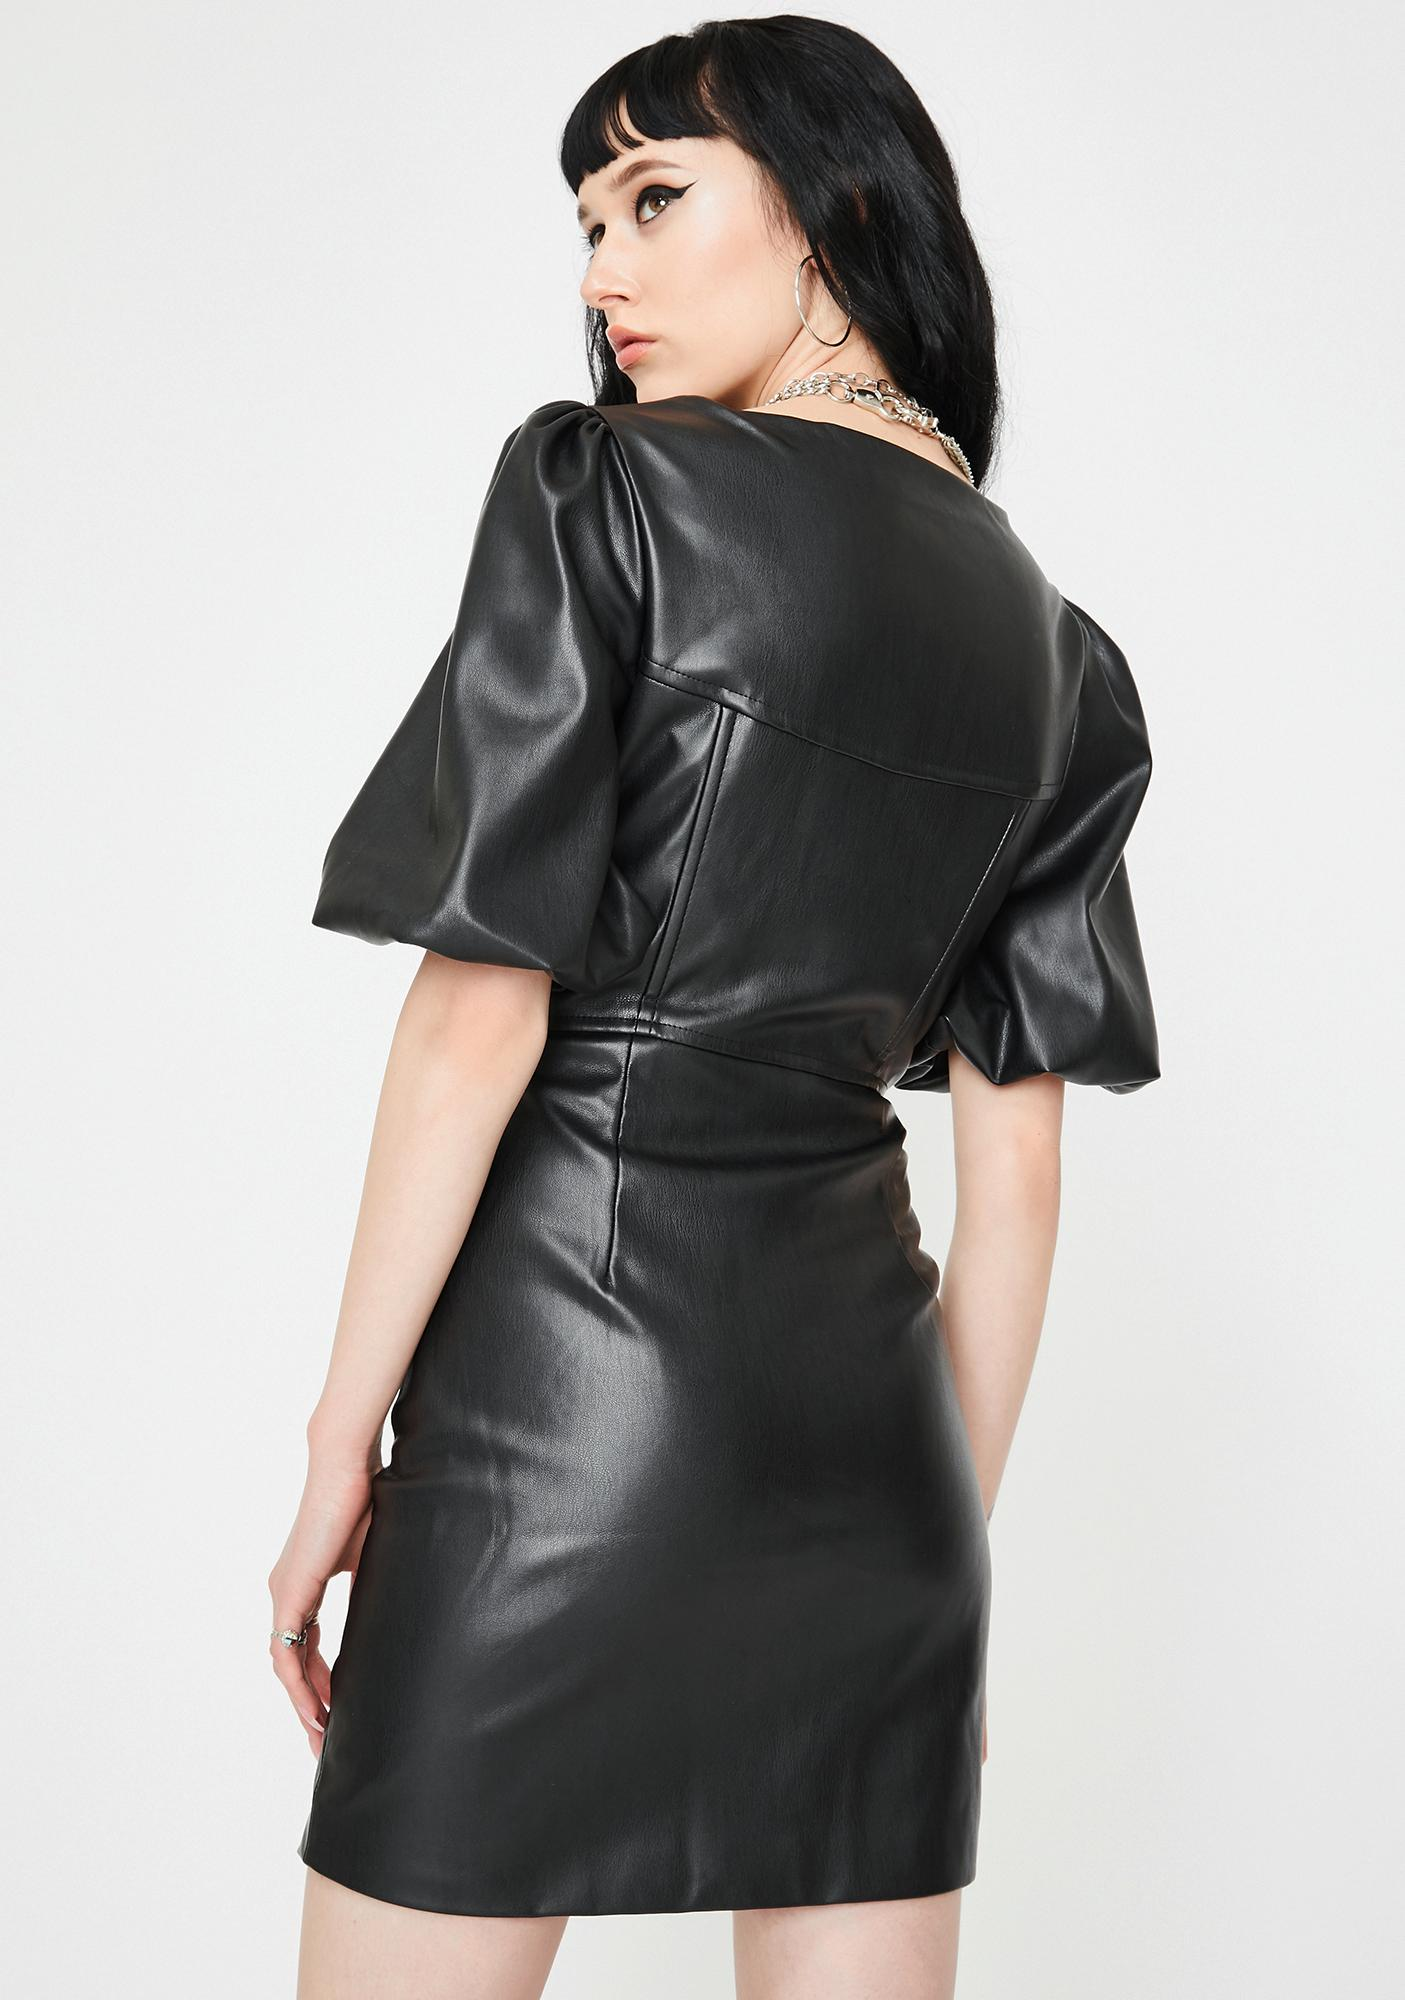 Jaded London Vegan Leather Corset Mini Dress